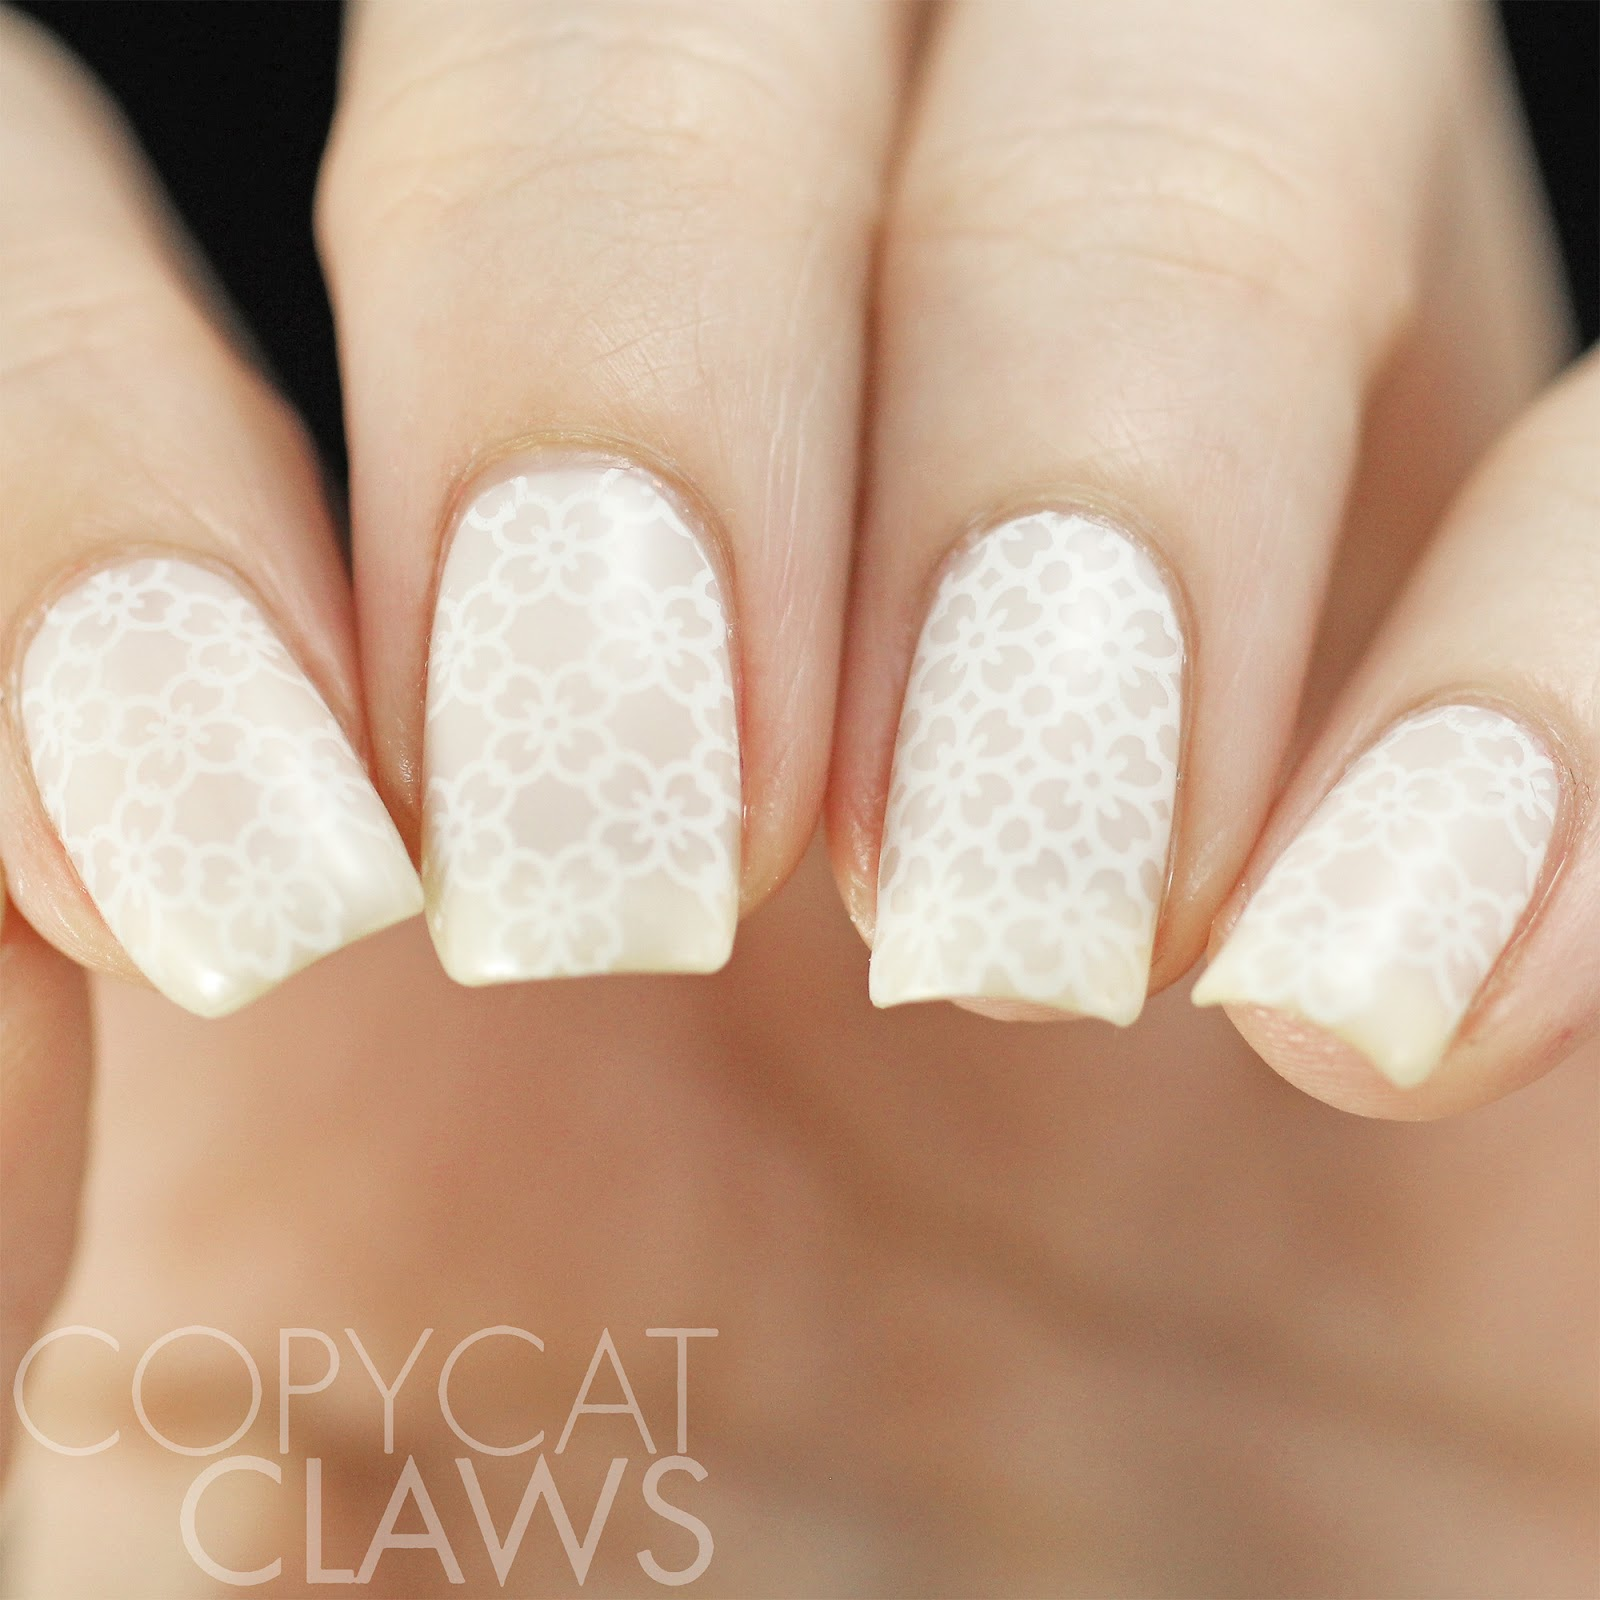 Copycat Claws: 40 Great Nail Art Ideas - Weddings